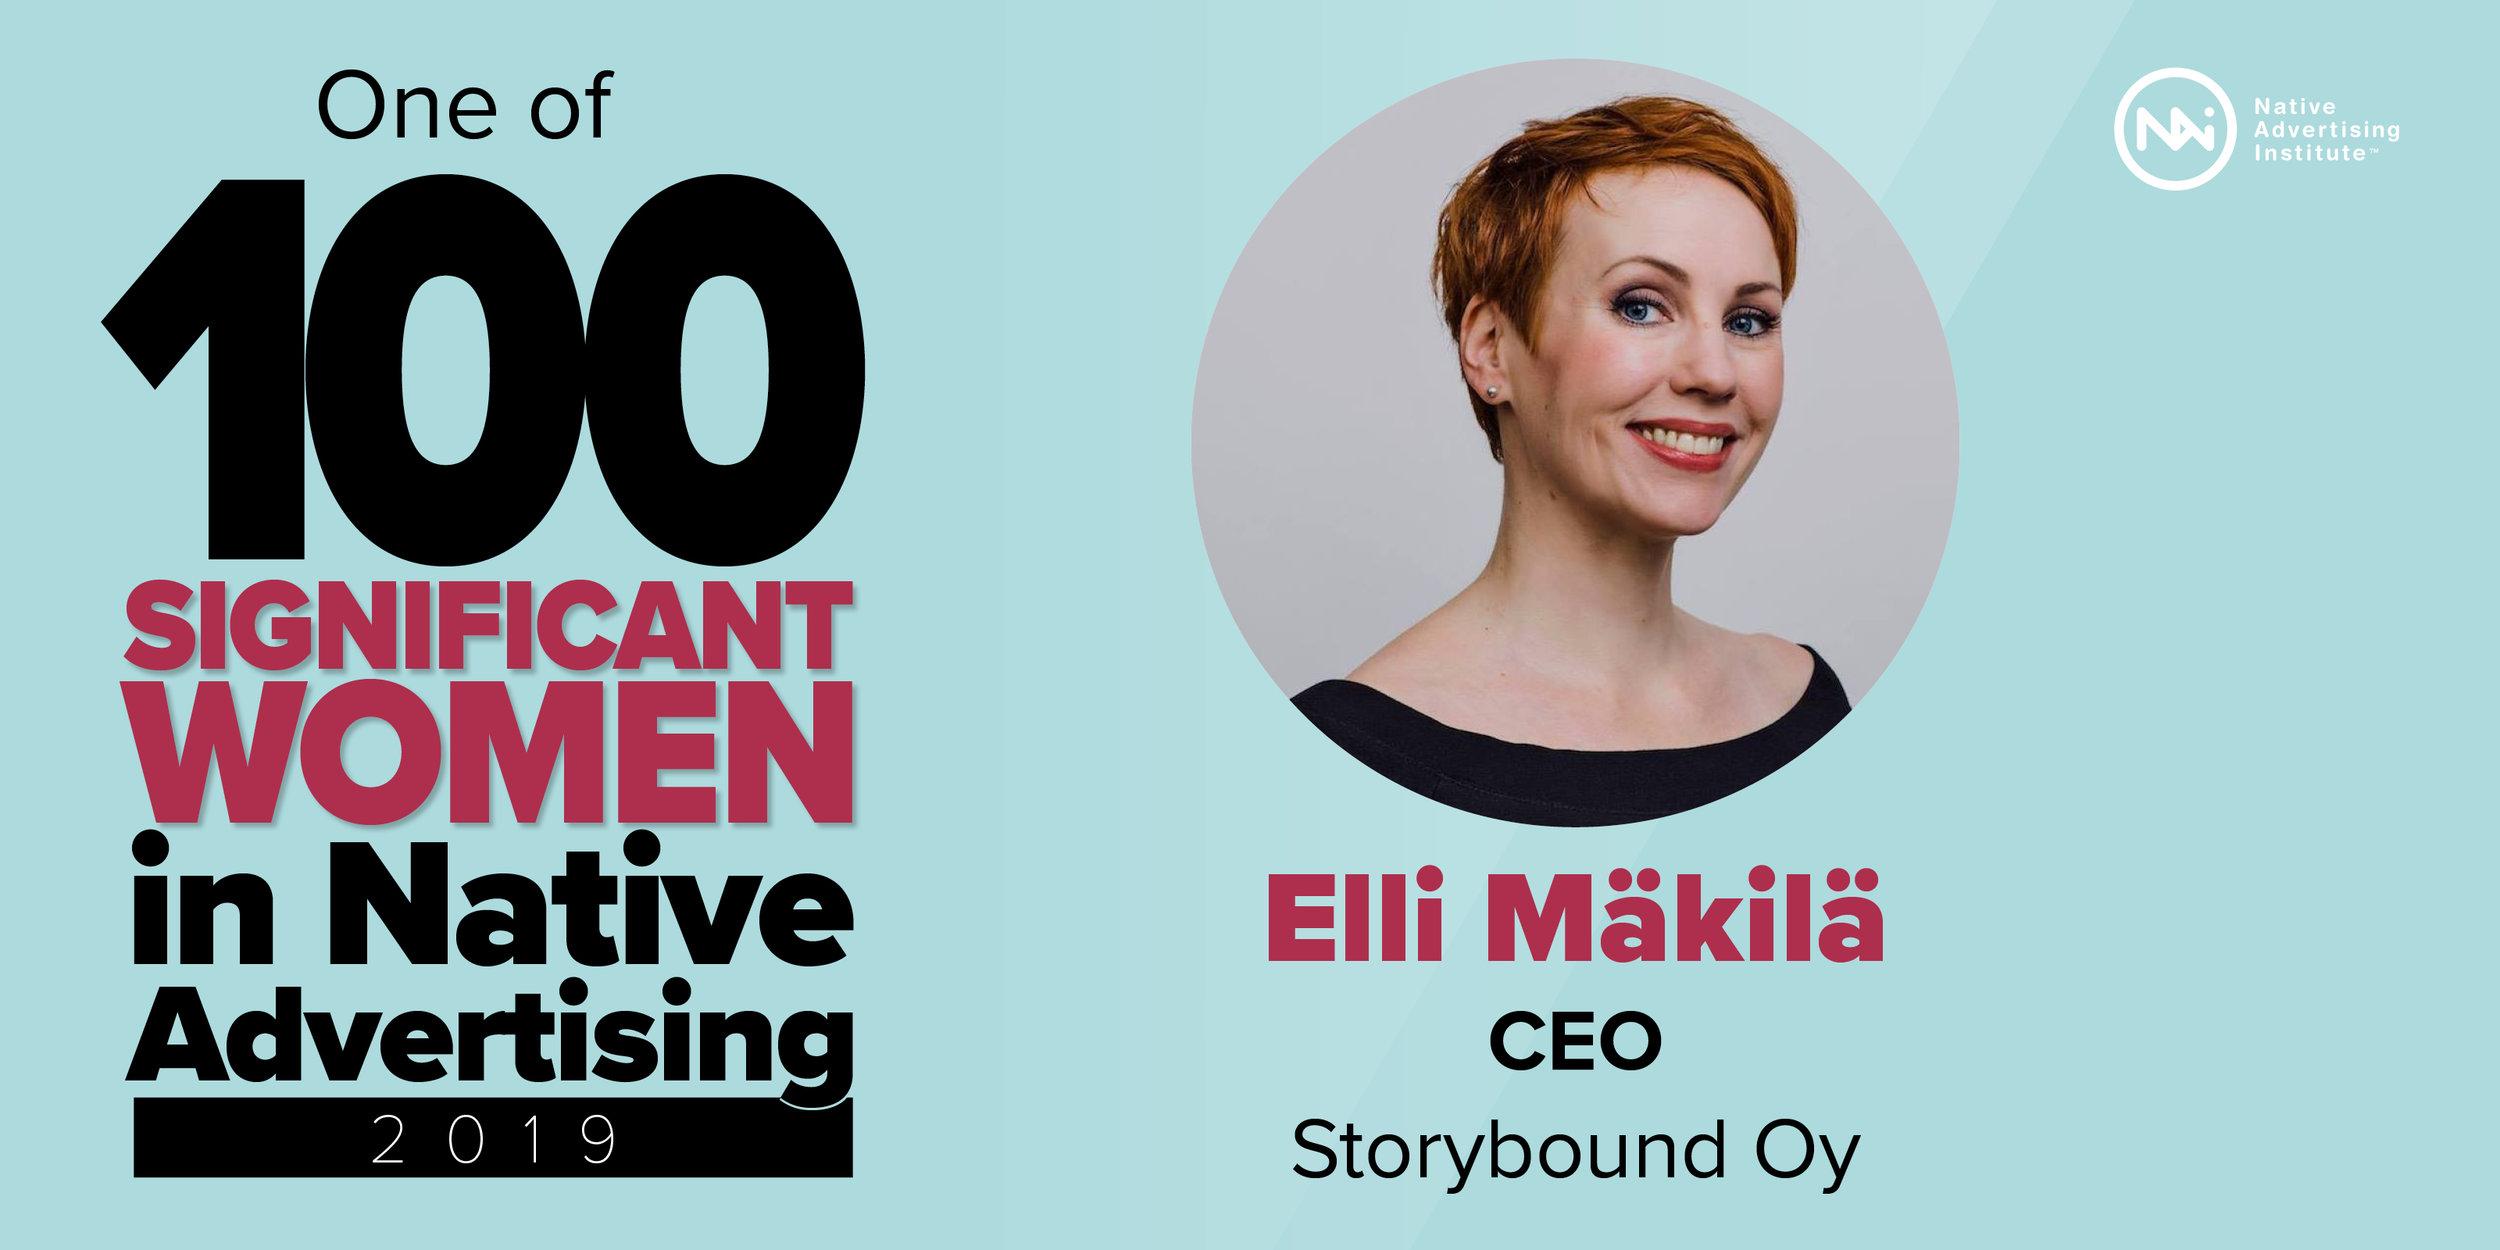 Elli Mäkilä significant woman in native advertising.jpeg